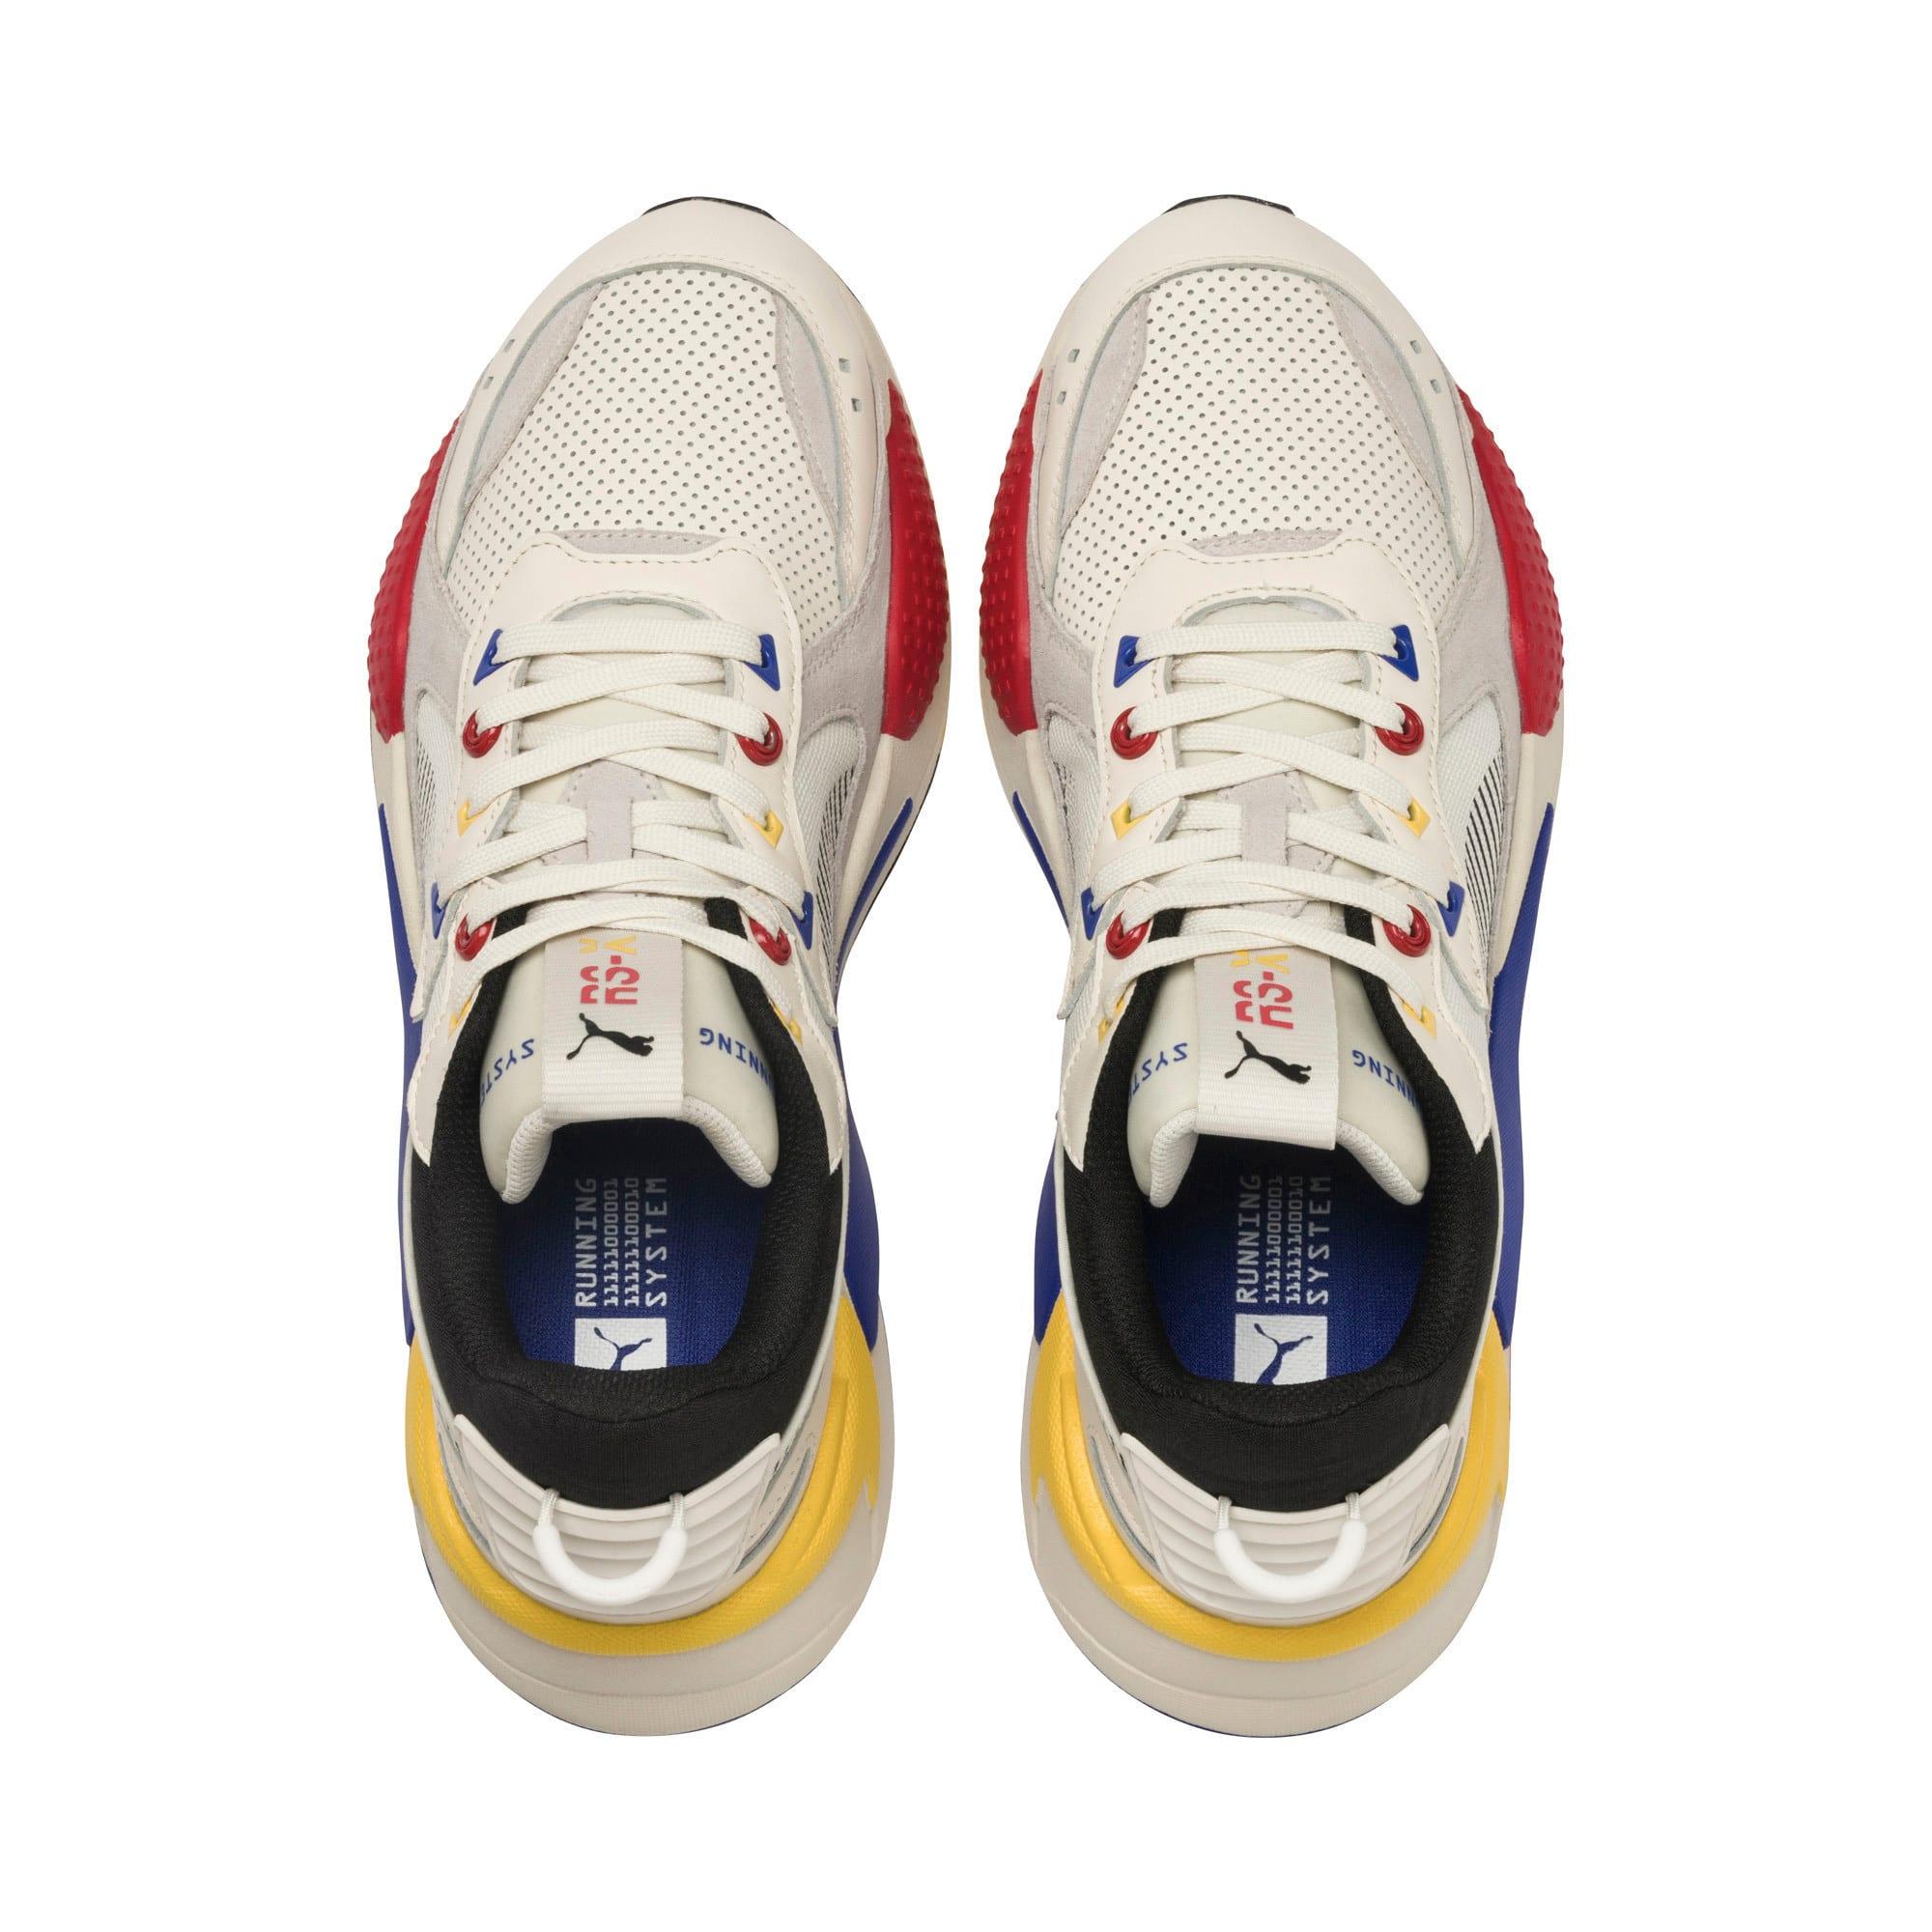 Thumbnail 7 of RS-X Colour Theory Sneaker, Whisper White-Puma Black, medium